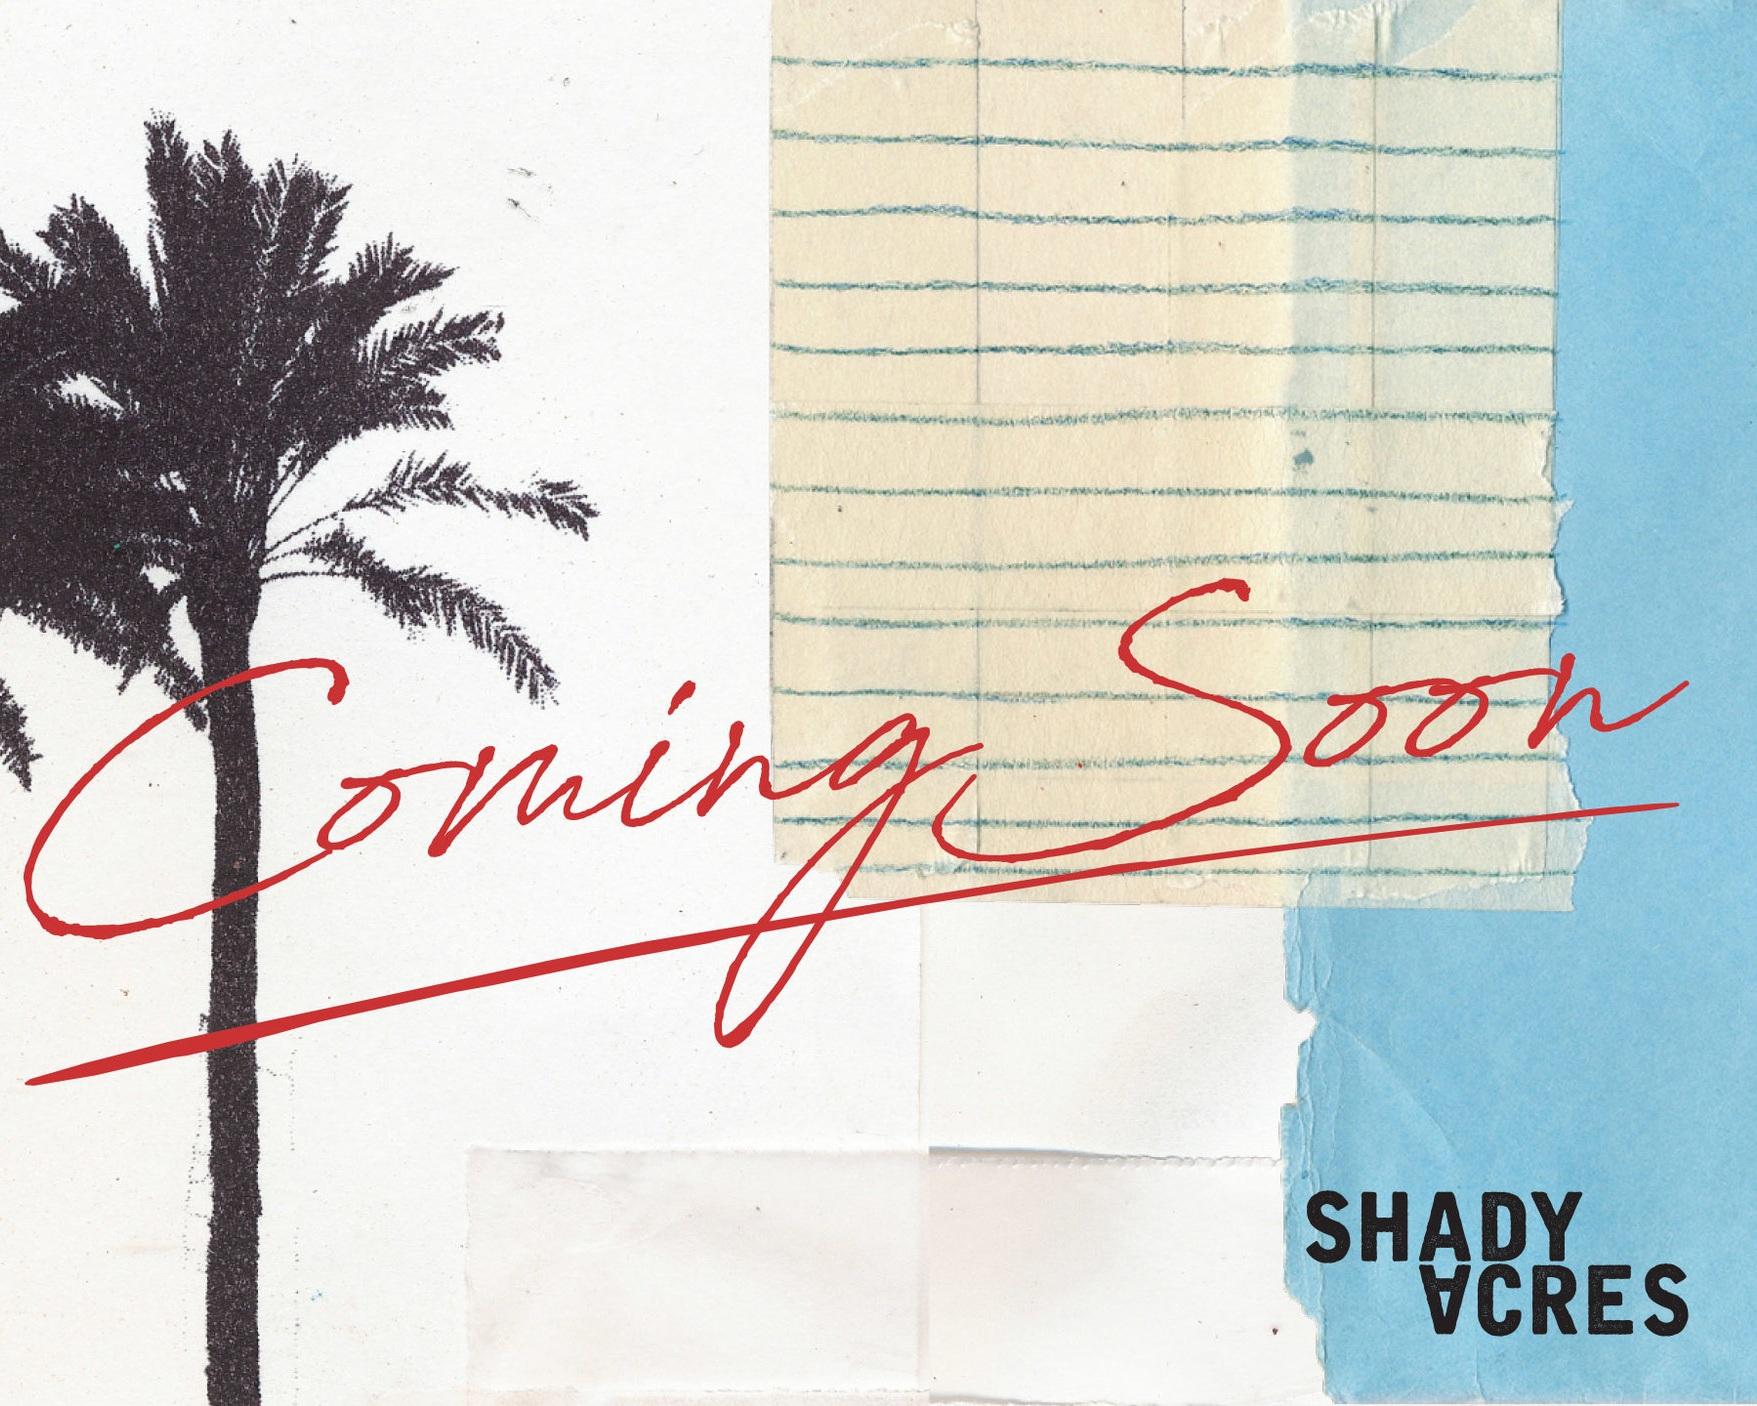 2019_Shady+Acres+Landing+Page-+Coming+Soon-Desktop_2560x1440.jpg